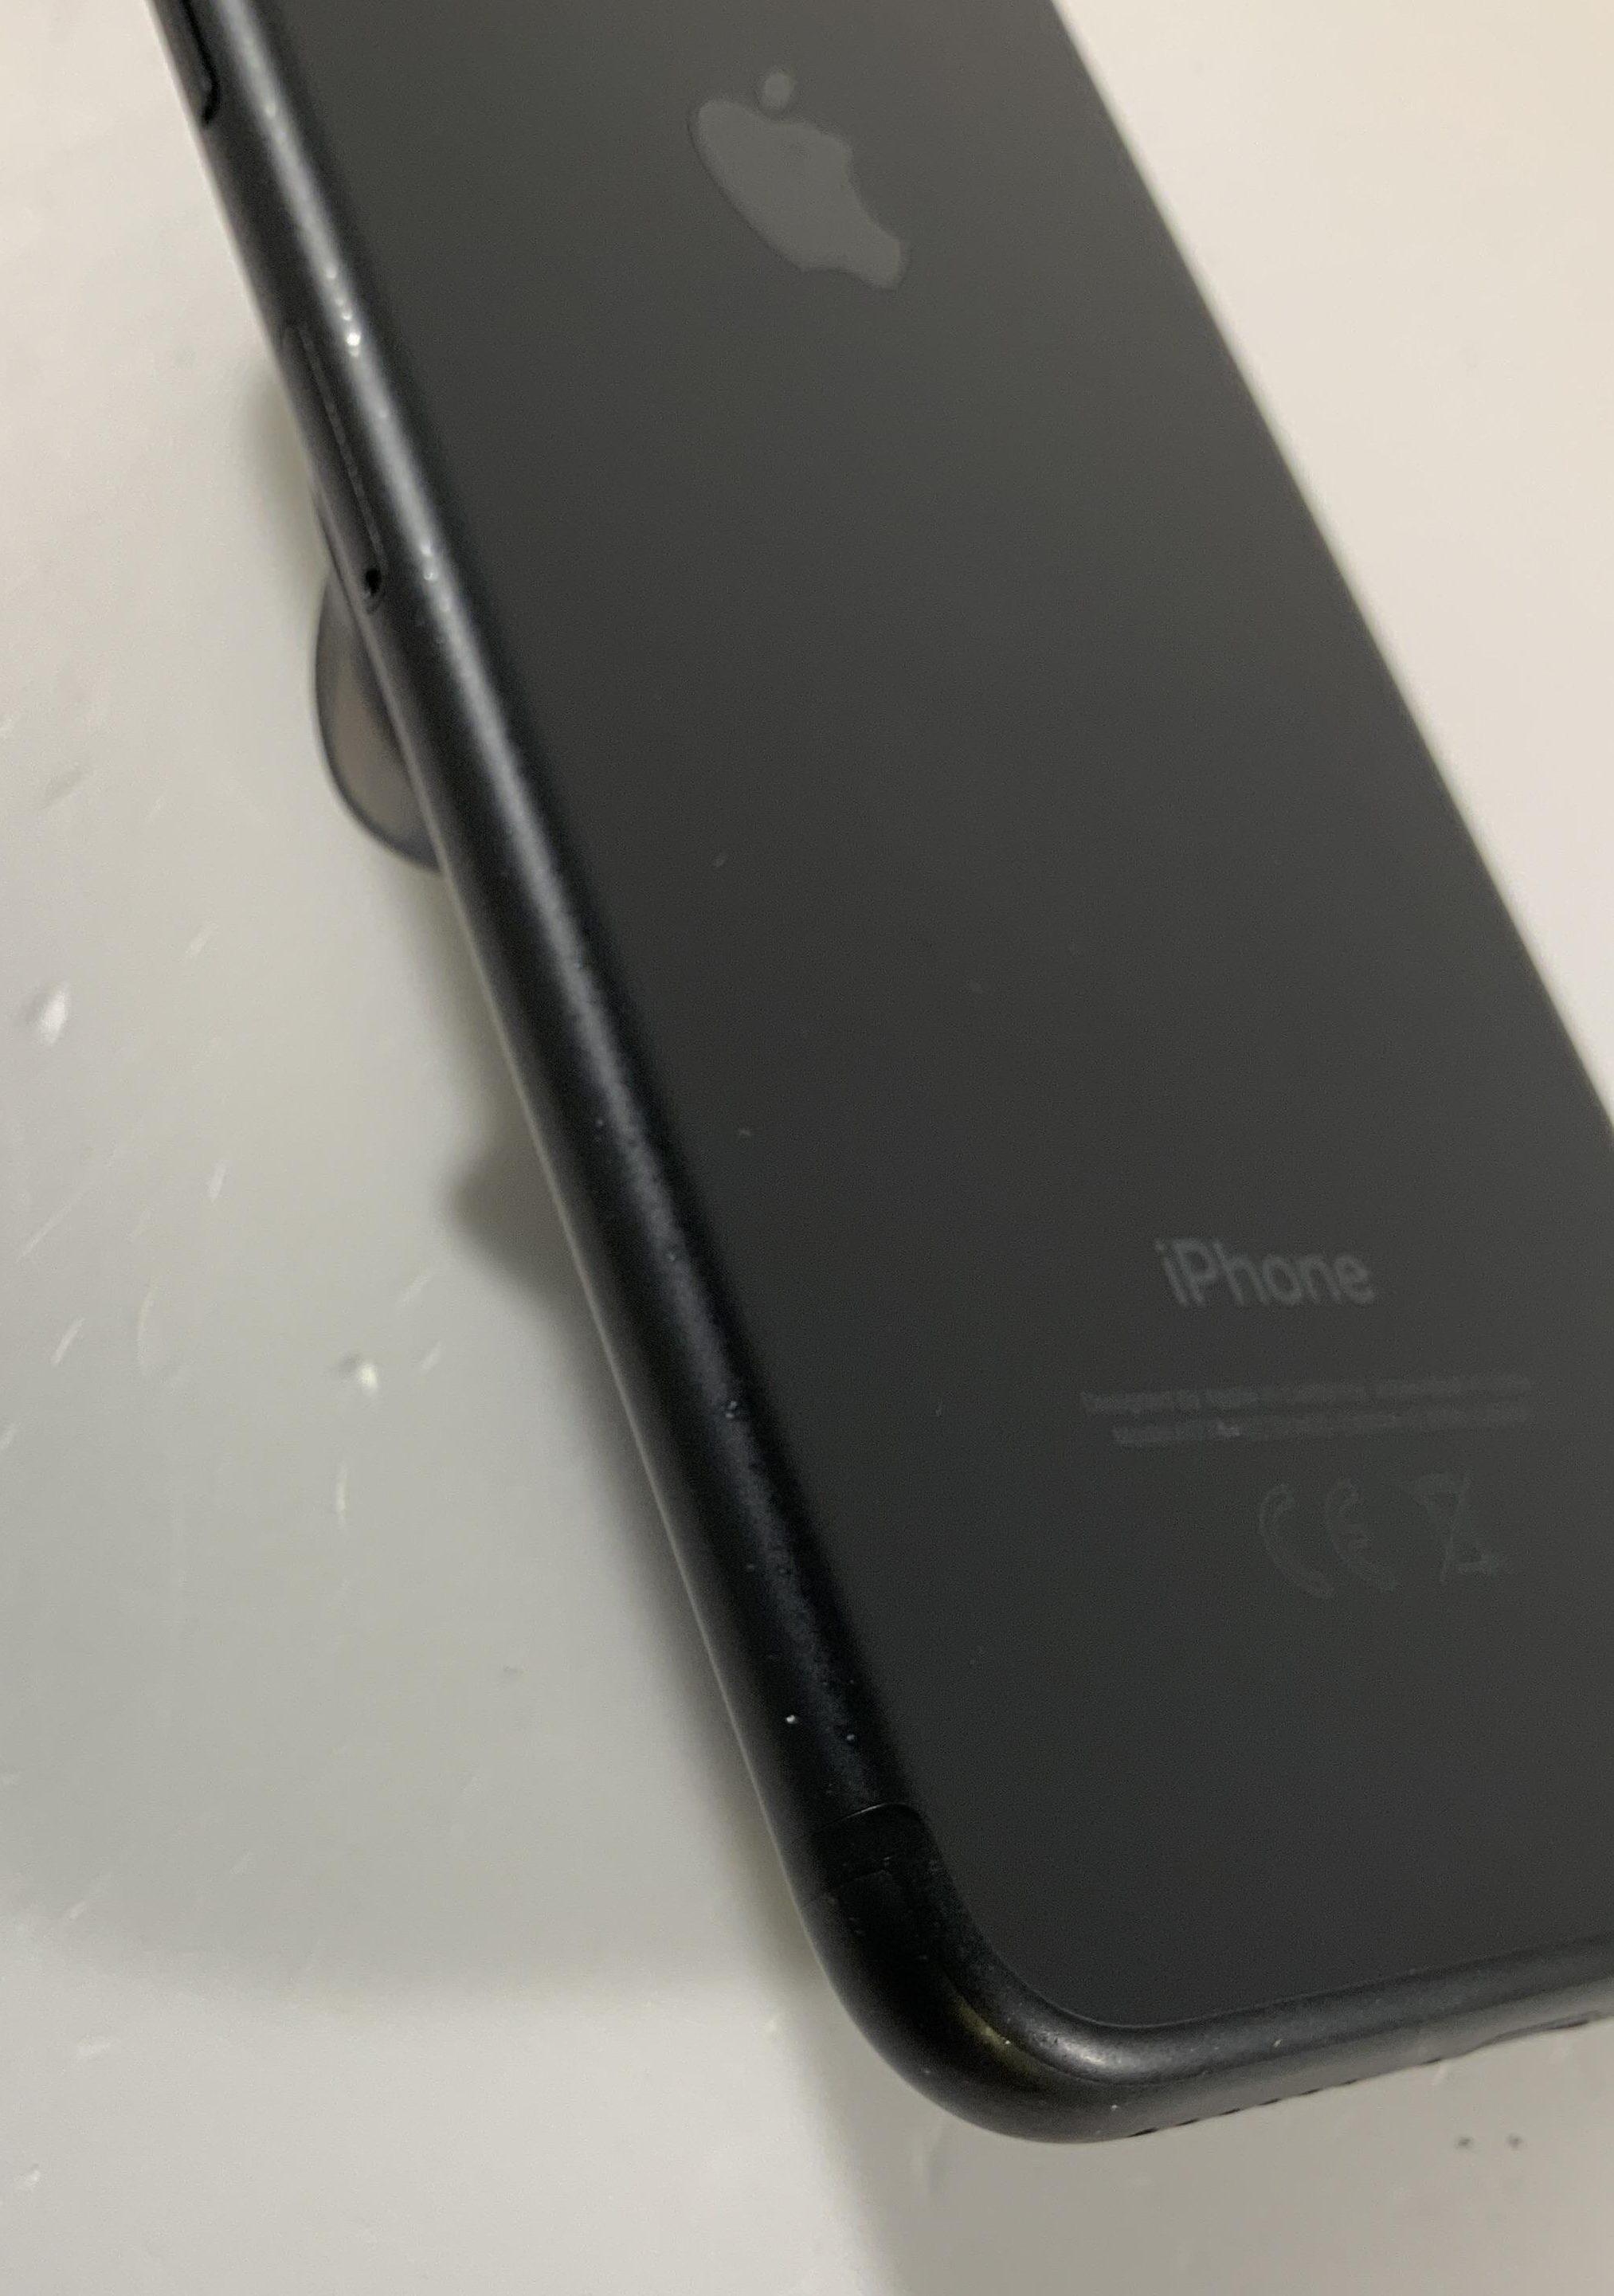 iPhone 7 32GB, 32GB, Black, Bild 4